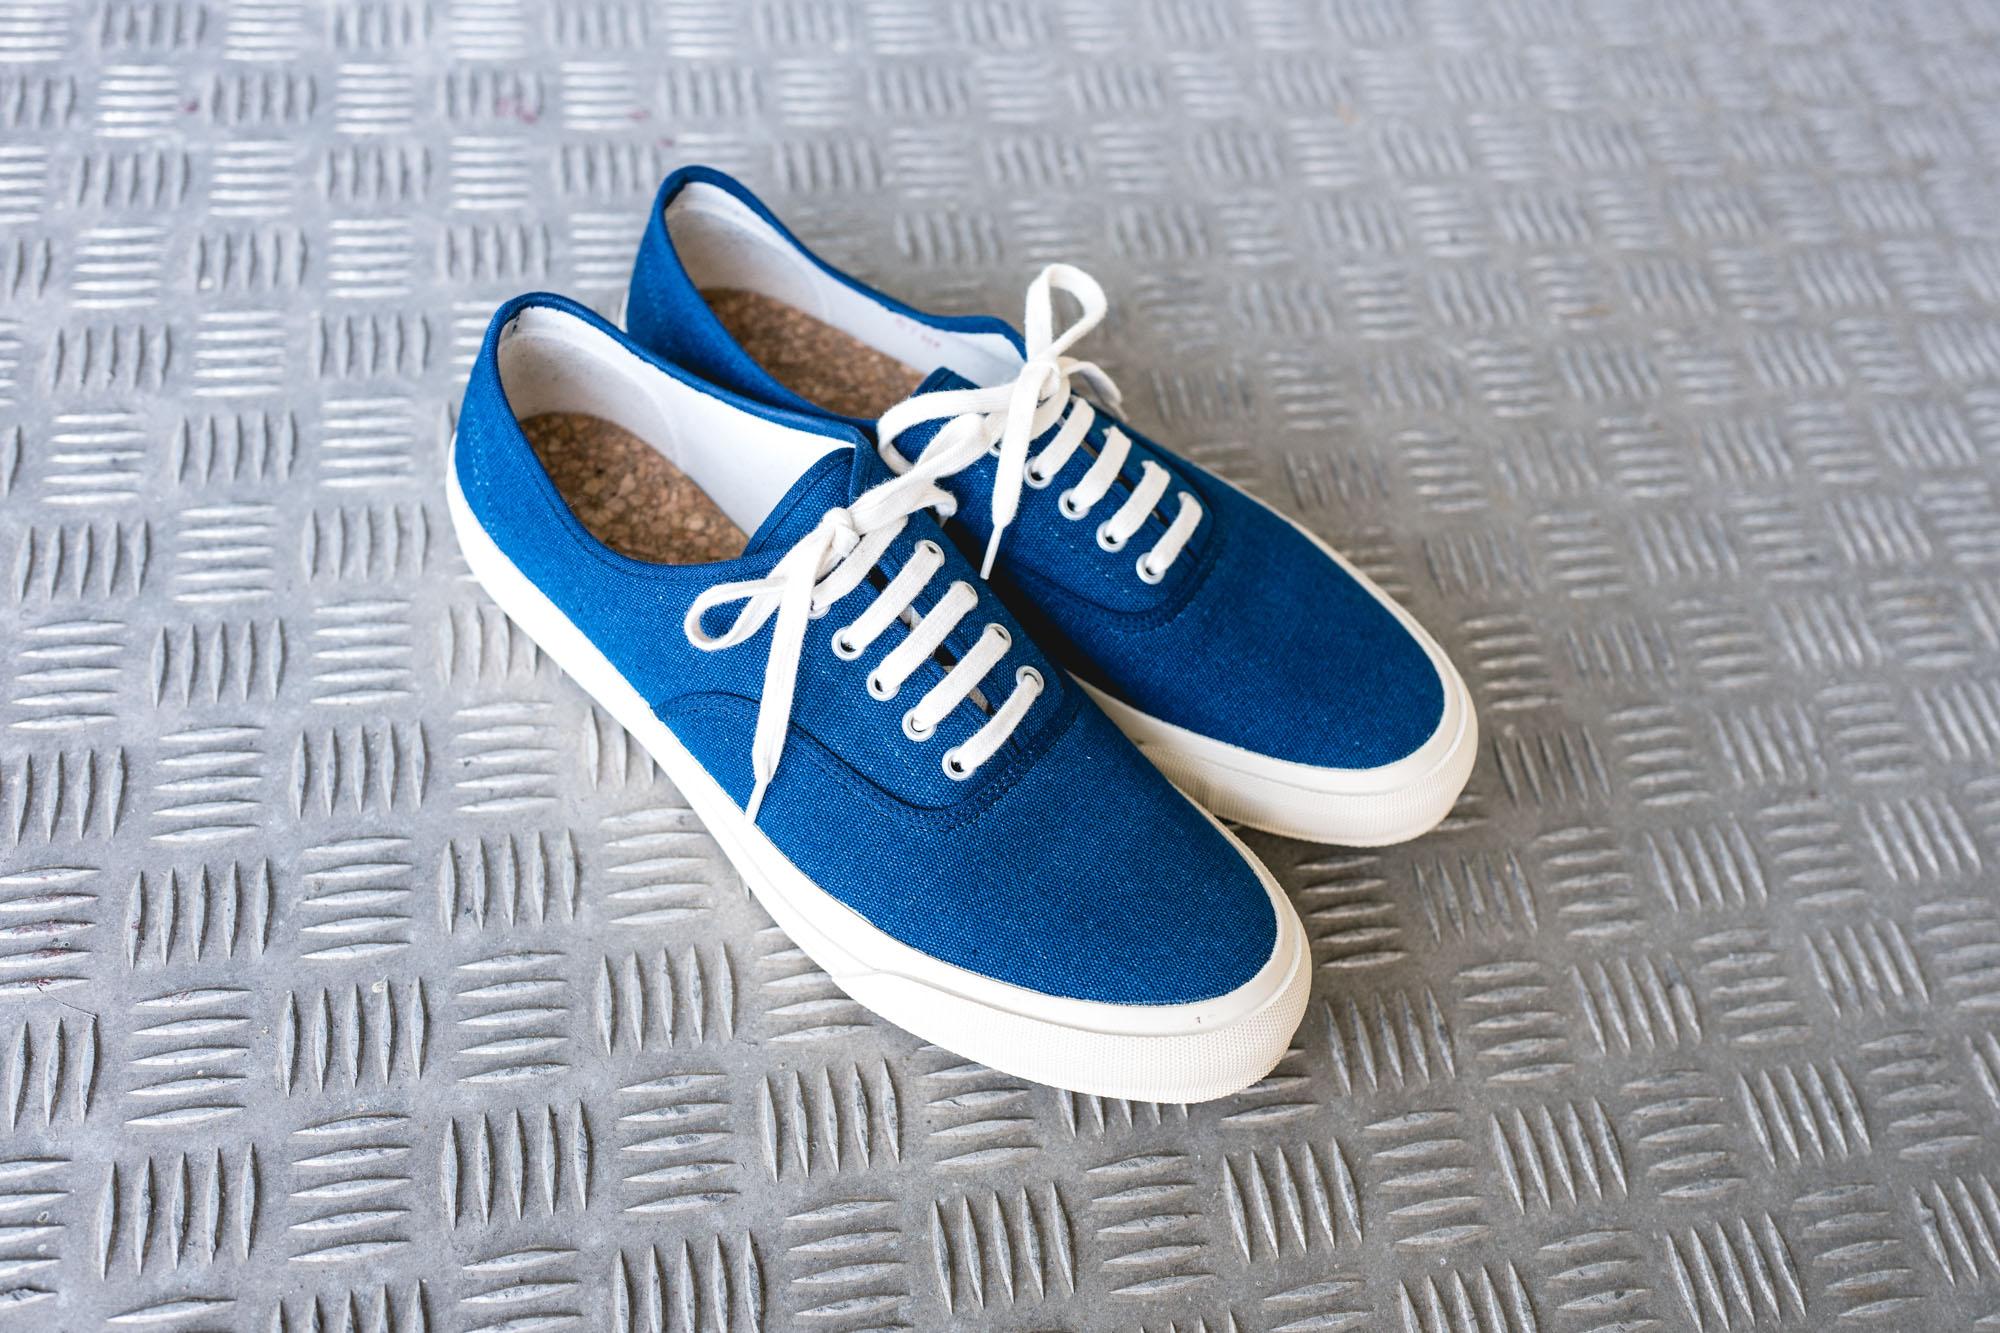 Doek Shoes Oxford Navy